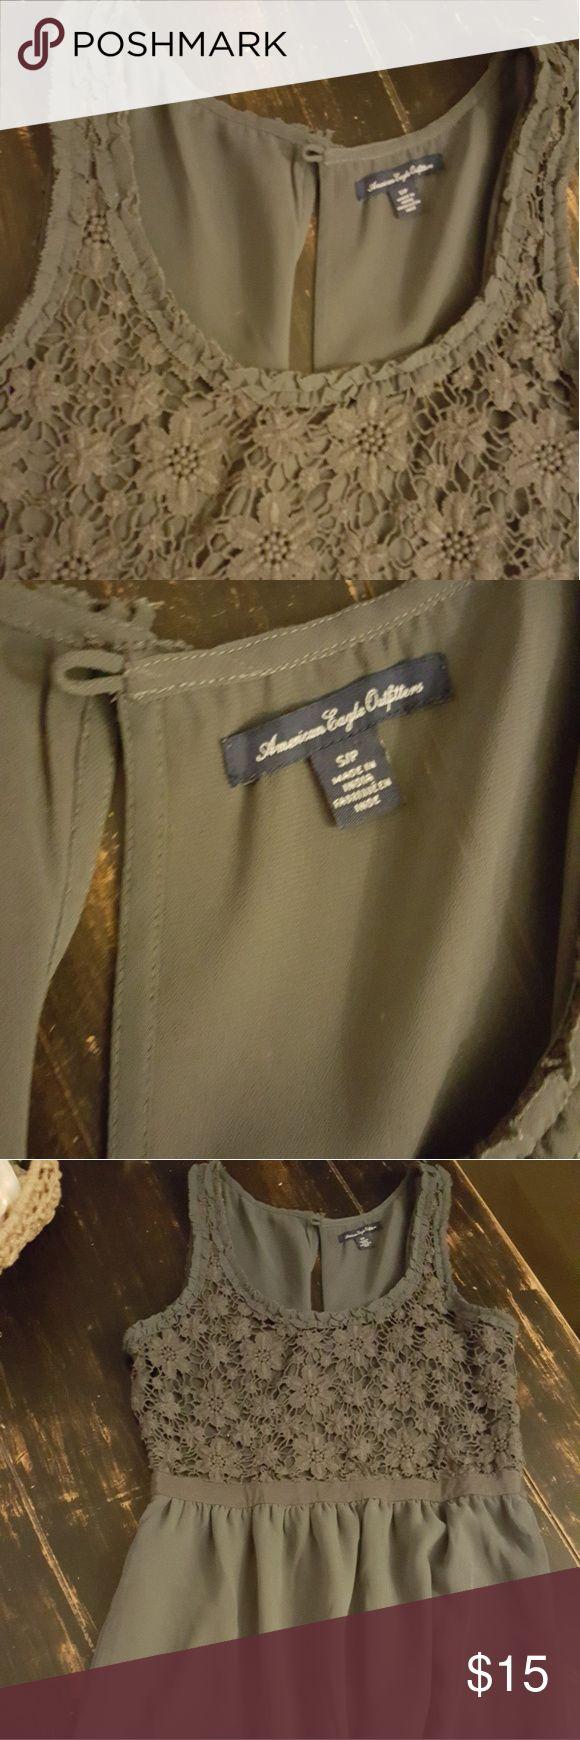 American eagle Gray American eagle dress American Eagle Outfitters Dresses Midi